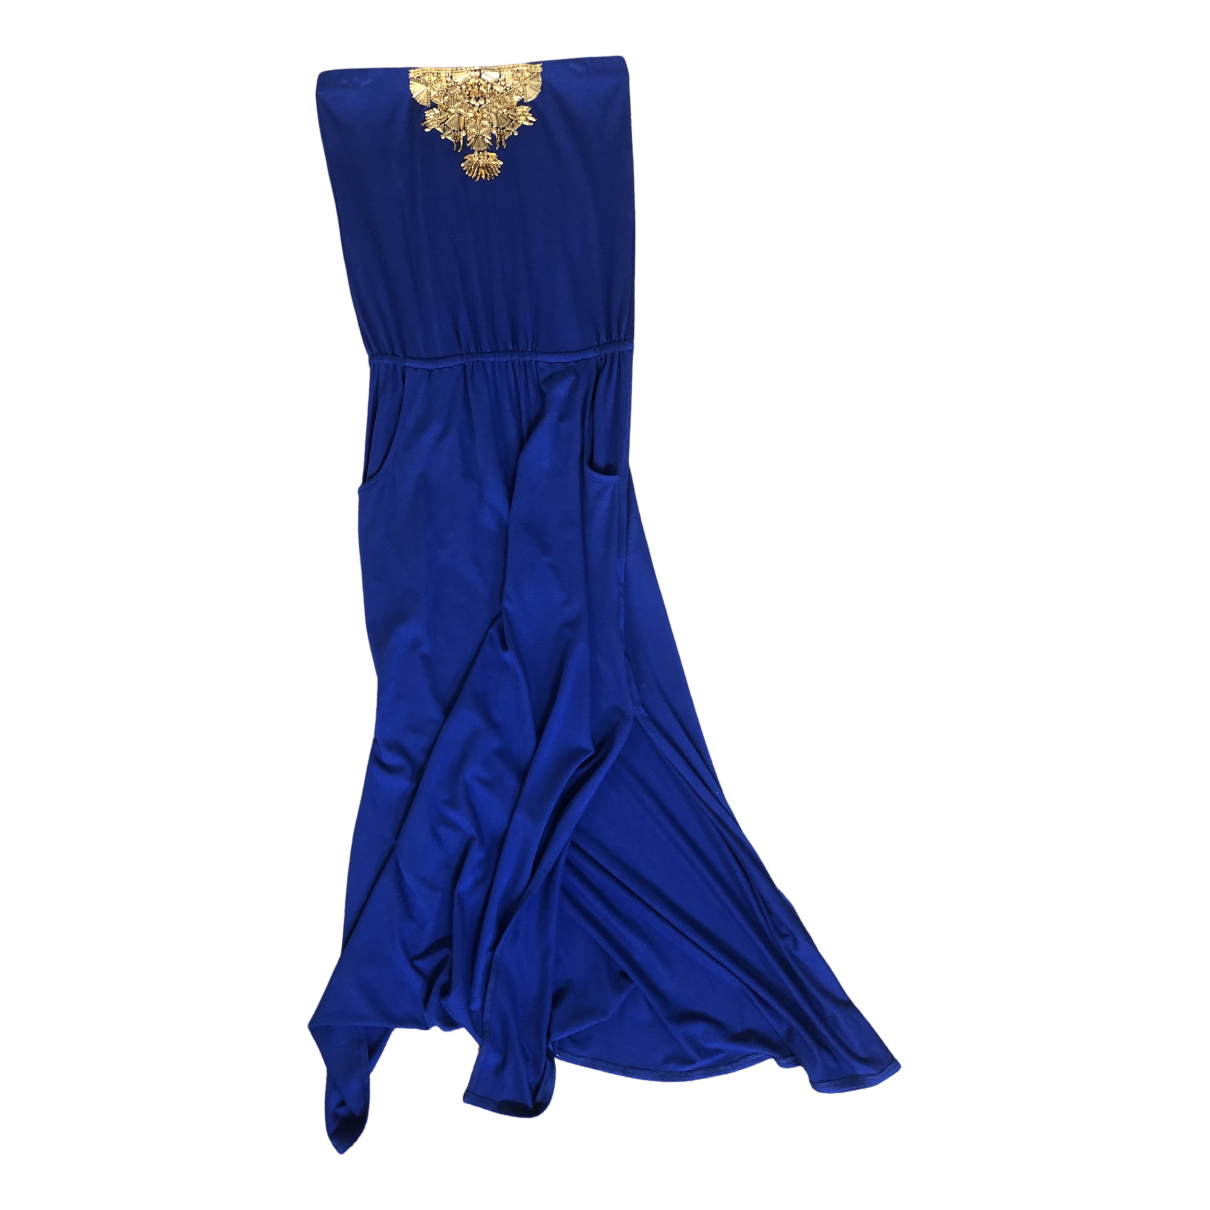 Melissa Odabash \N Blue dress for Women S International